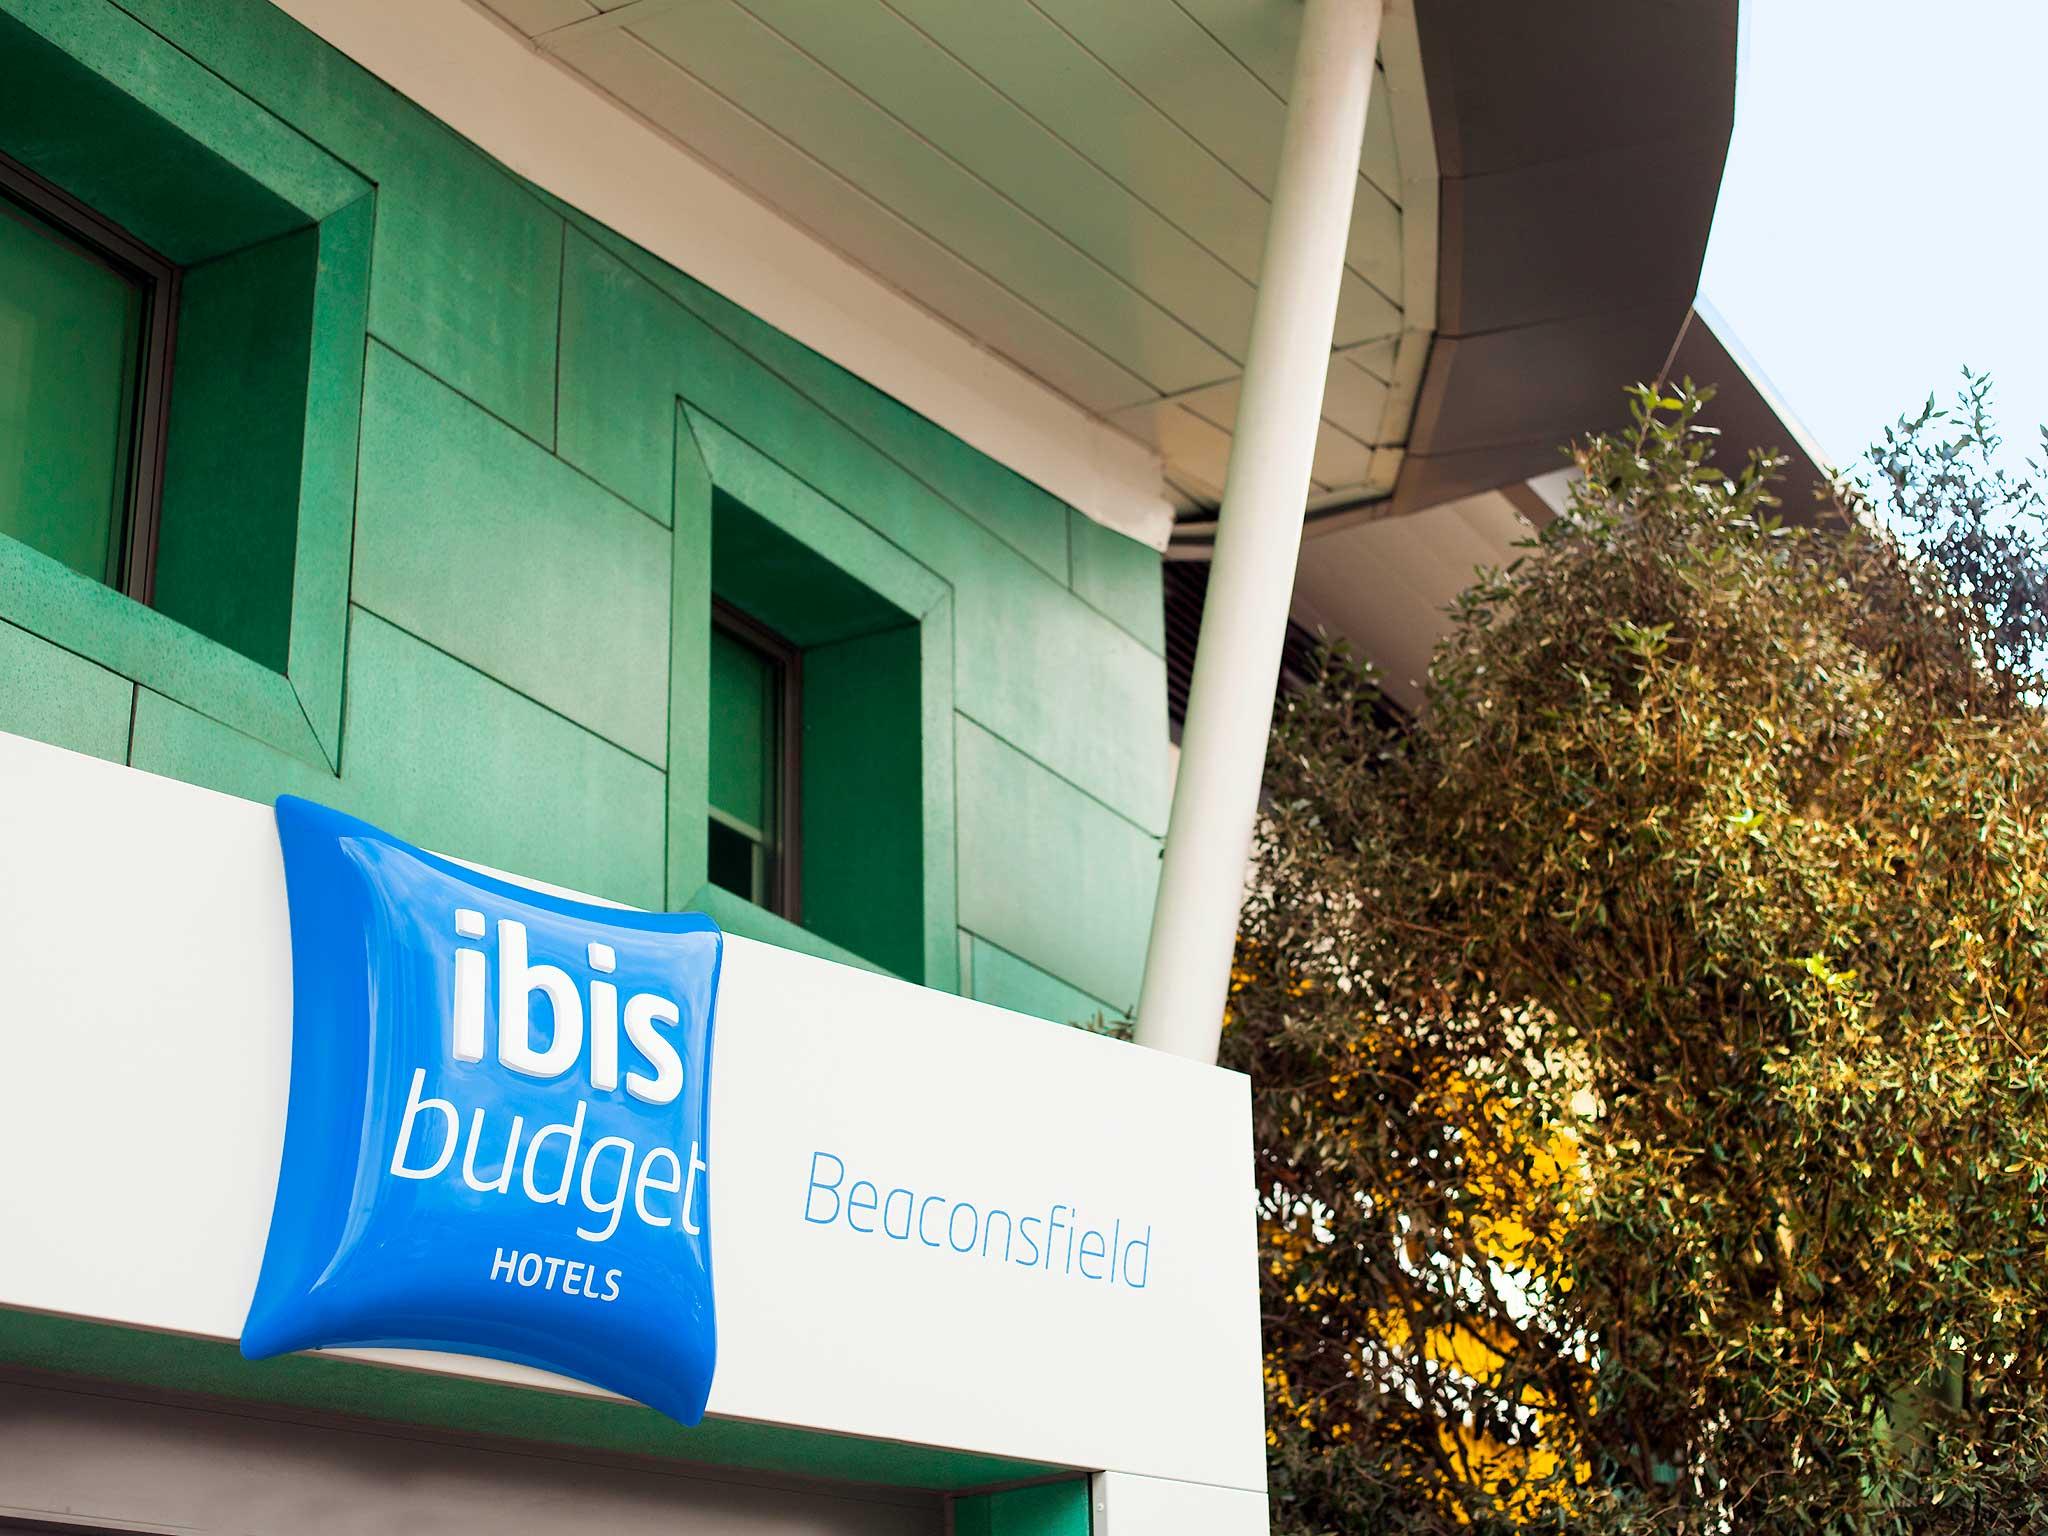 Hotel – ibis budget Beaconsfield